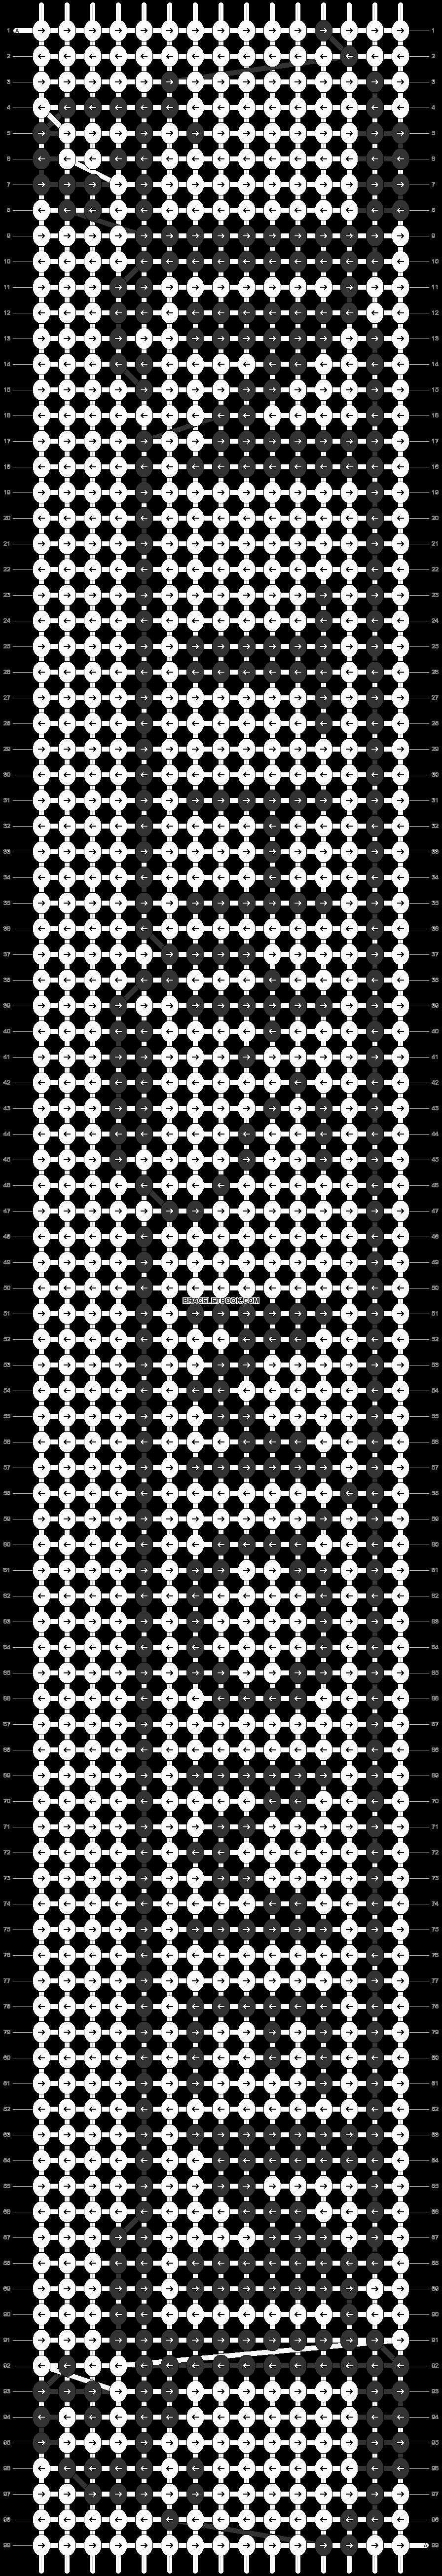 Alpha pattern #7329 pattern